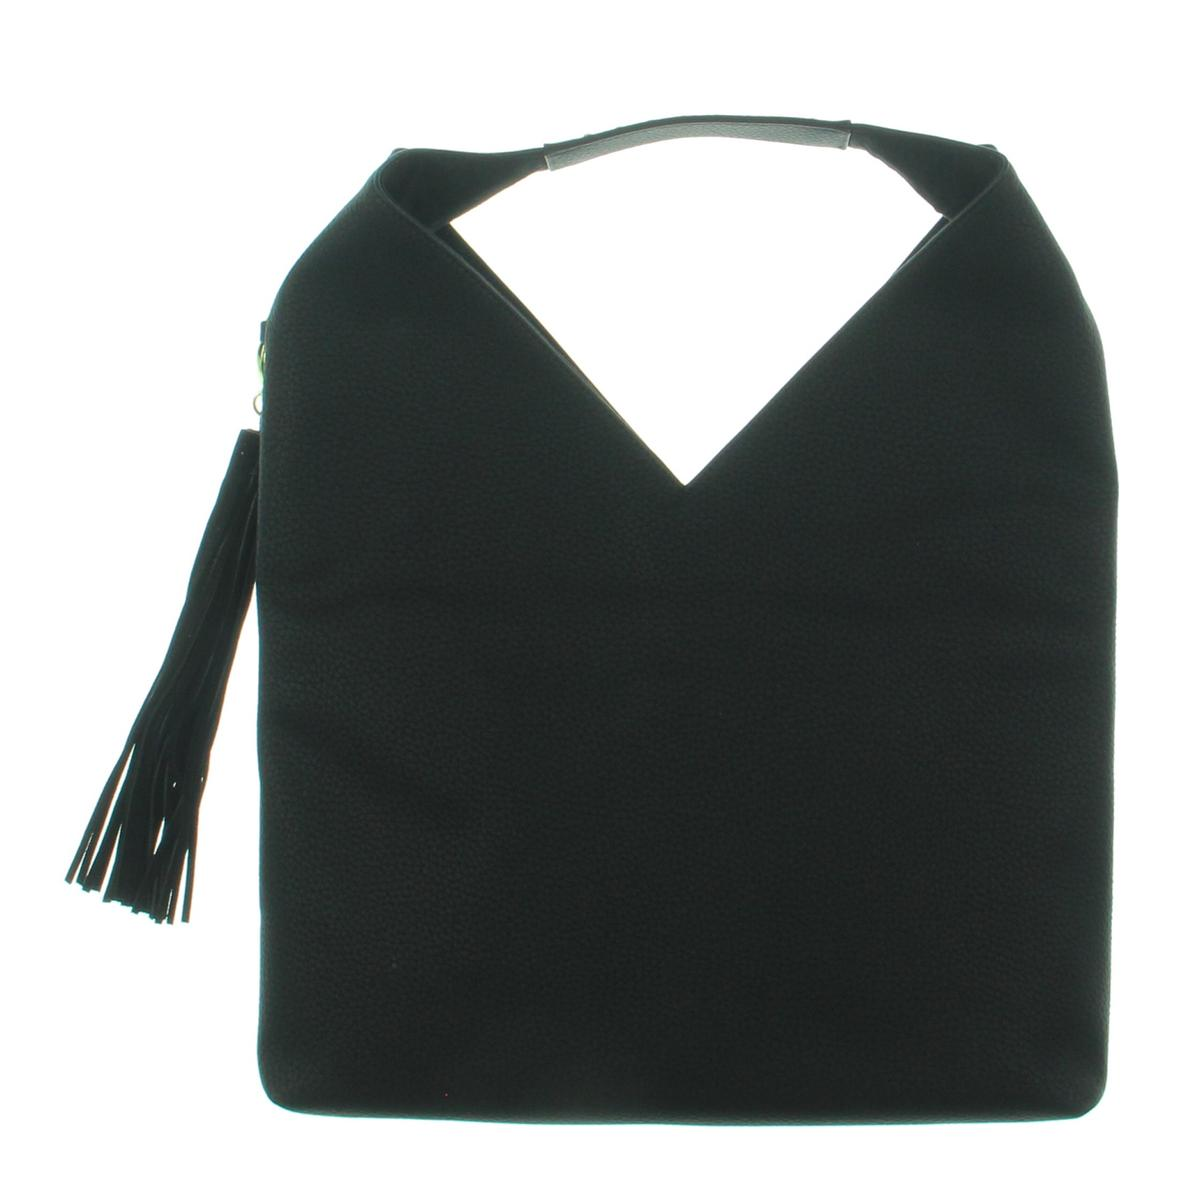 39de0916e268 Details about Steve Madden Womens Bcomfyy Black Studded Hobo Handbag Purse  Large BHFO 8834